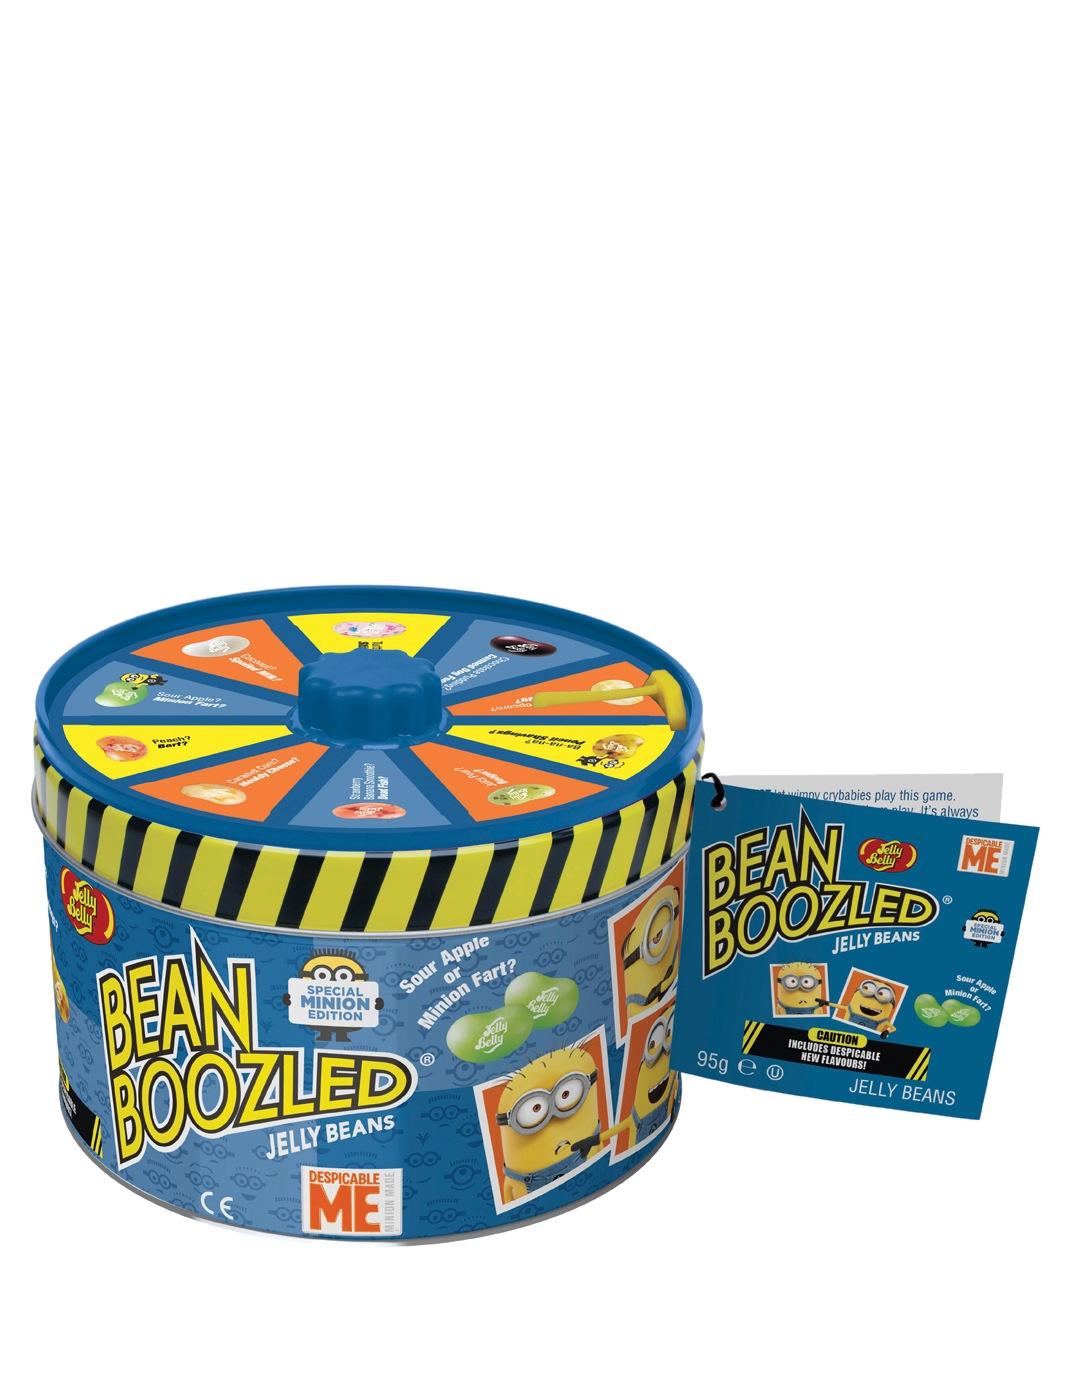 Giant Bean Boozled Complete Iphone 8 Kuxniya Refill Harry Potter Spinner Dispenser Jelly Belly Beanboozled Beans 99g